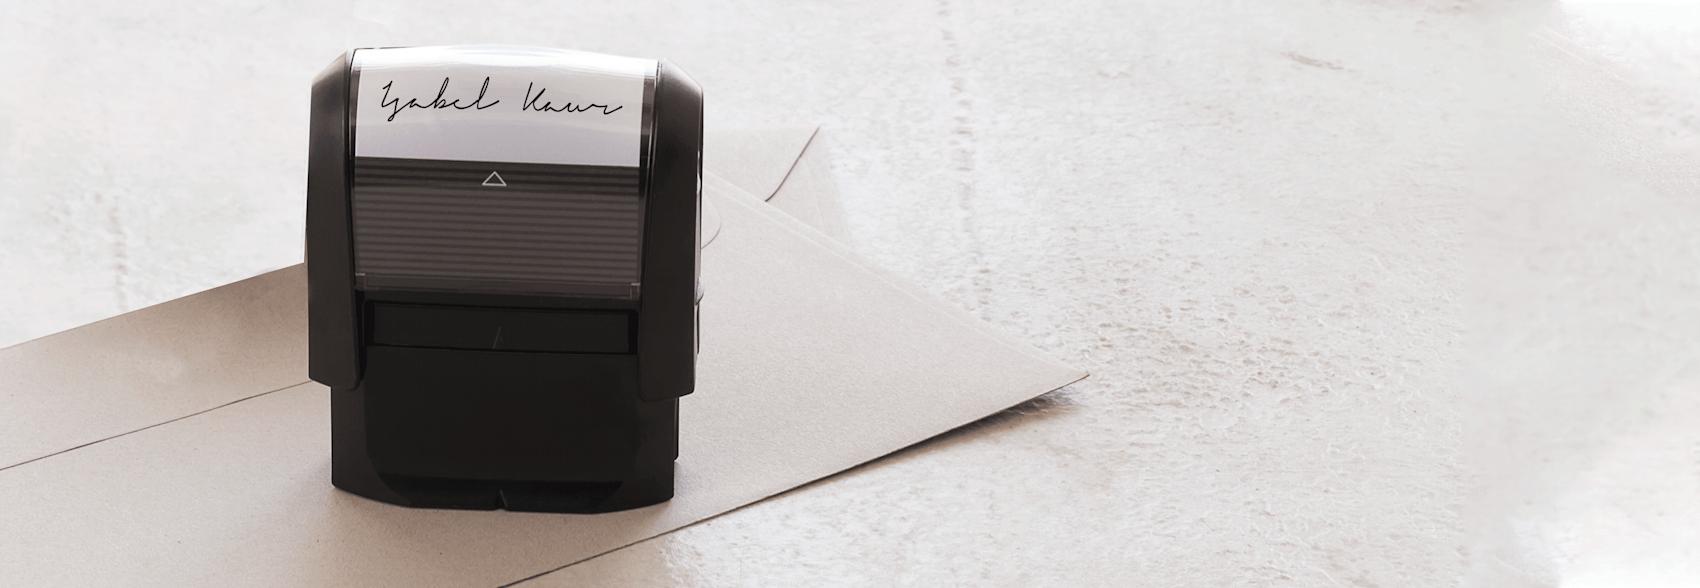 personalised self-inking stamp